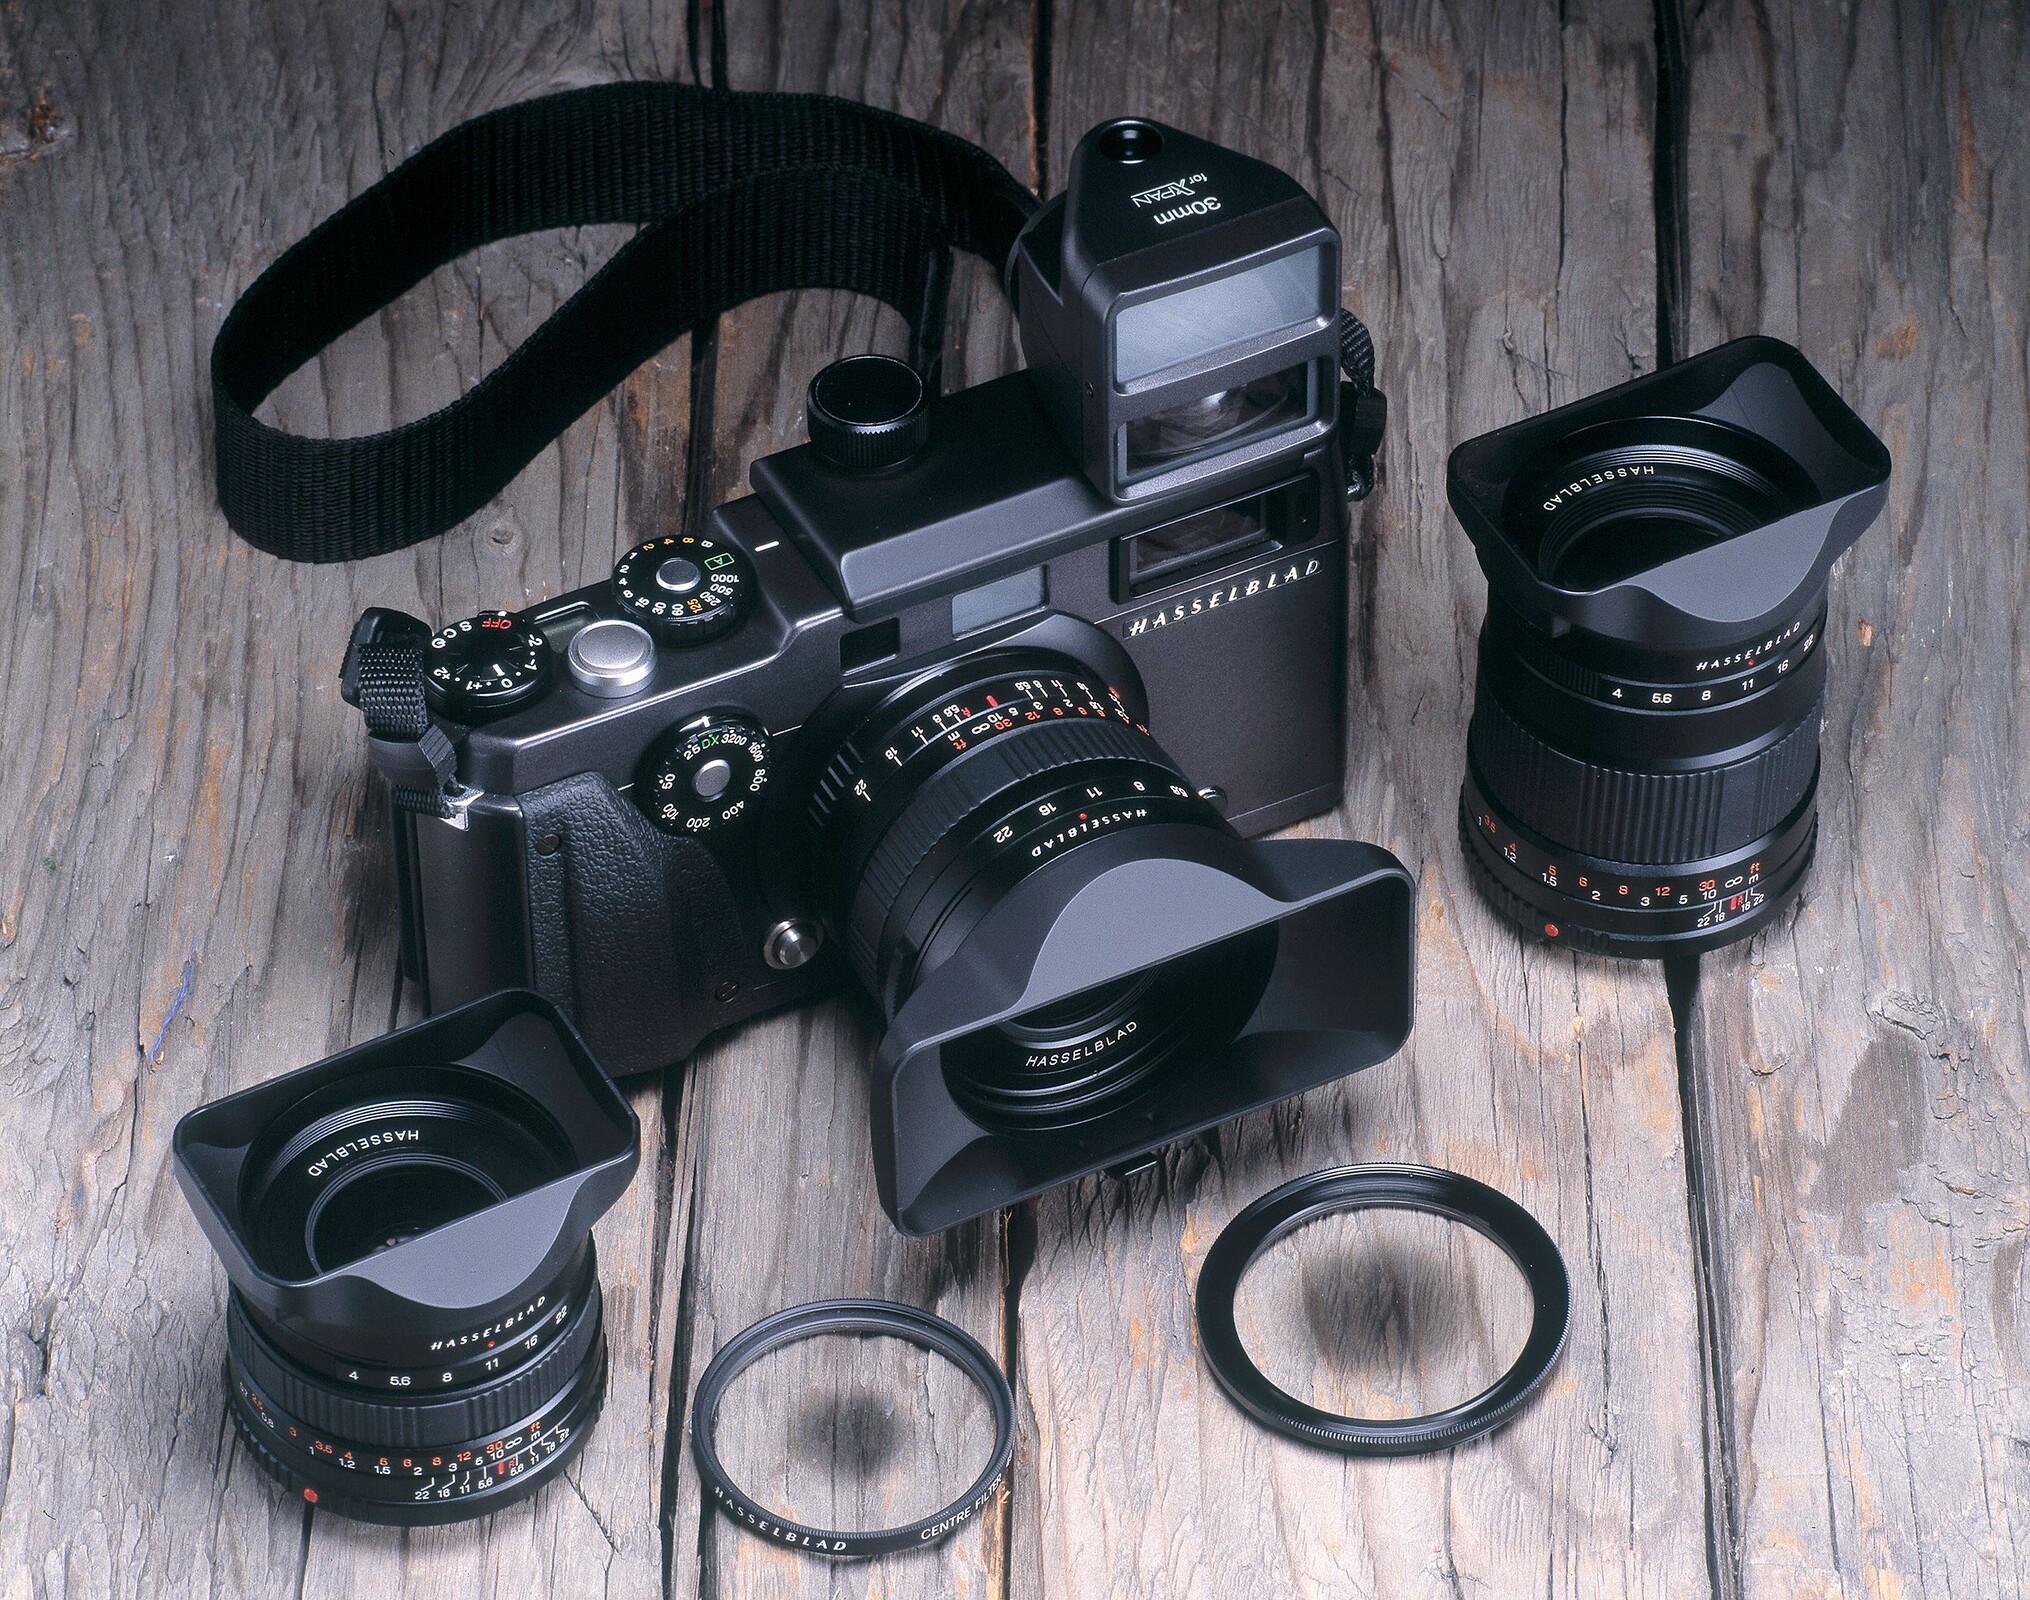 Hasselblad XPan camera